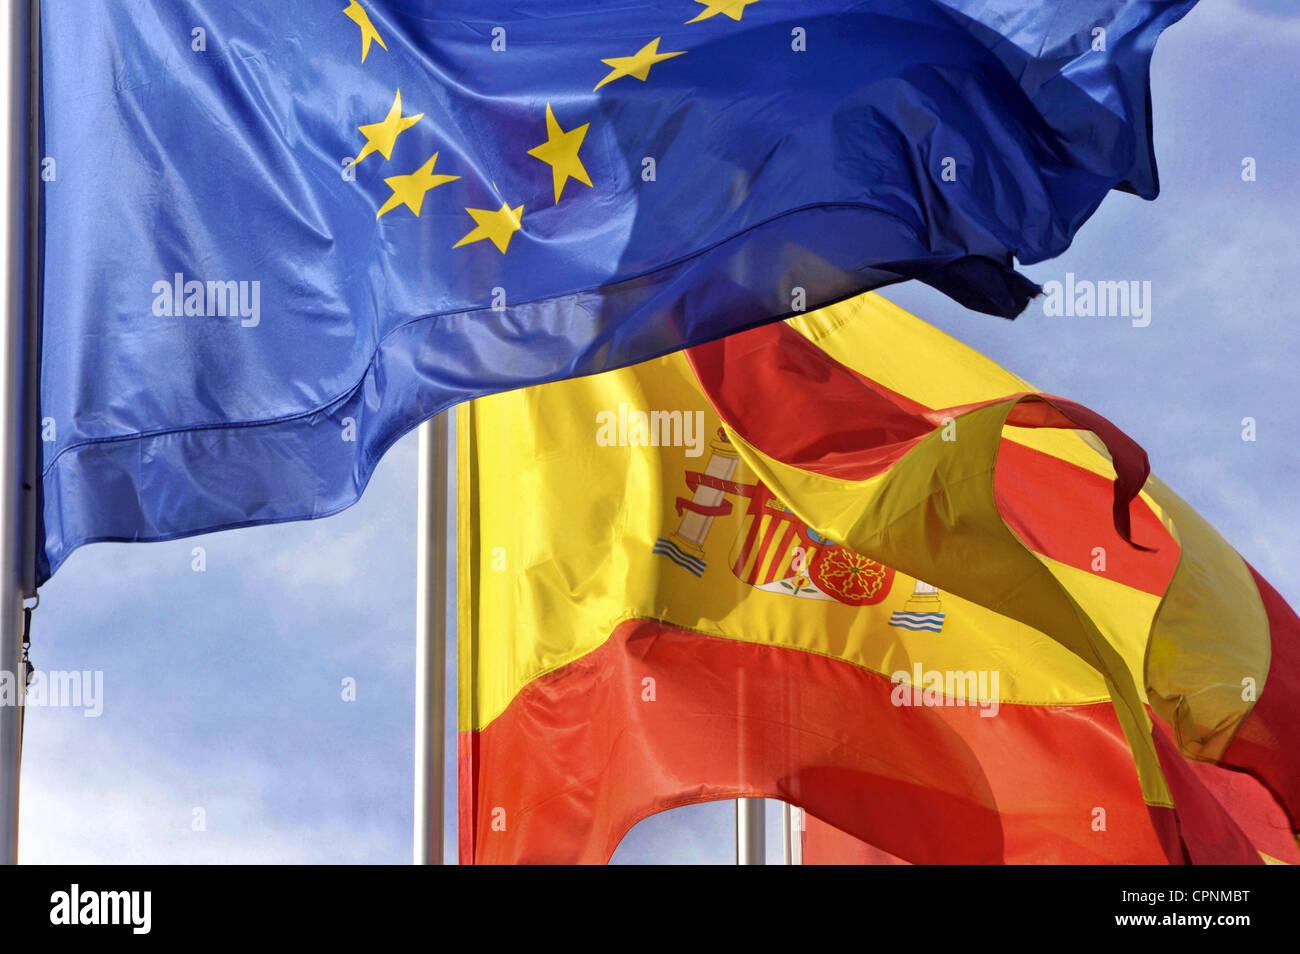 heraldry flag spain european and spanish flag waving in the